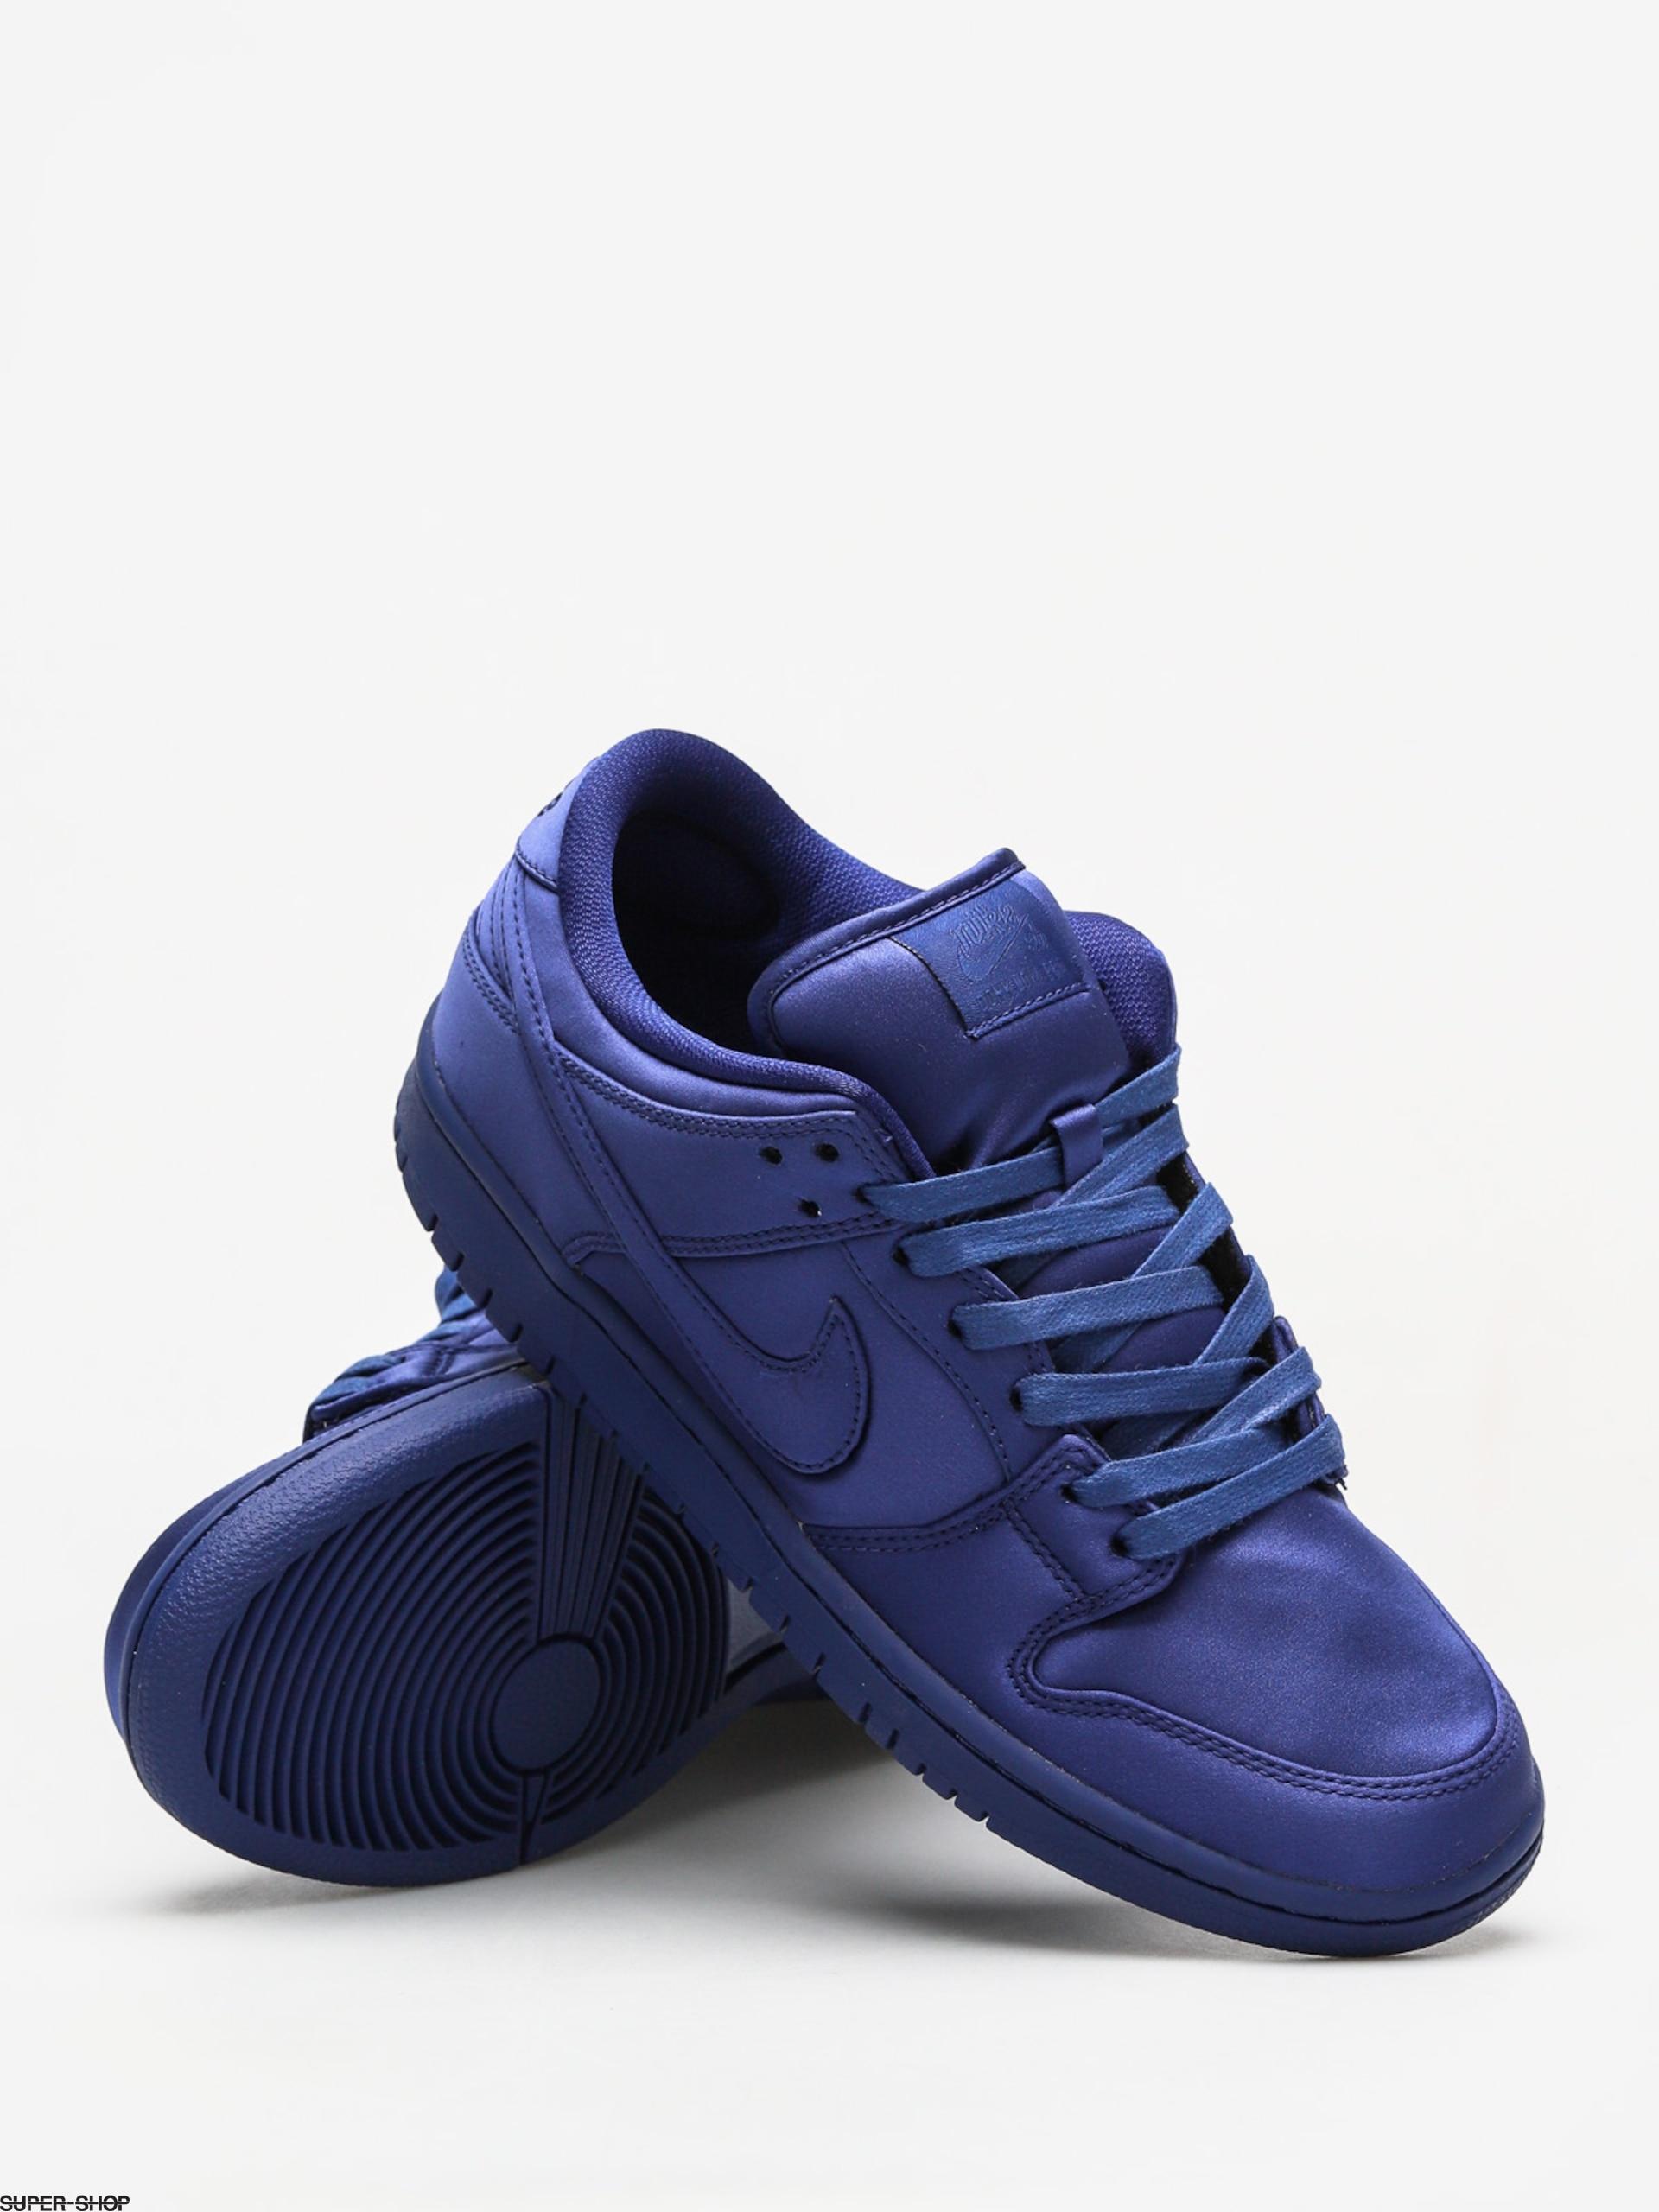 separation shoes 63b56 d05c2 Nike SB Sb Dunk Low TRD NBA Shoes (deep royal blue/deep royal blue)